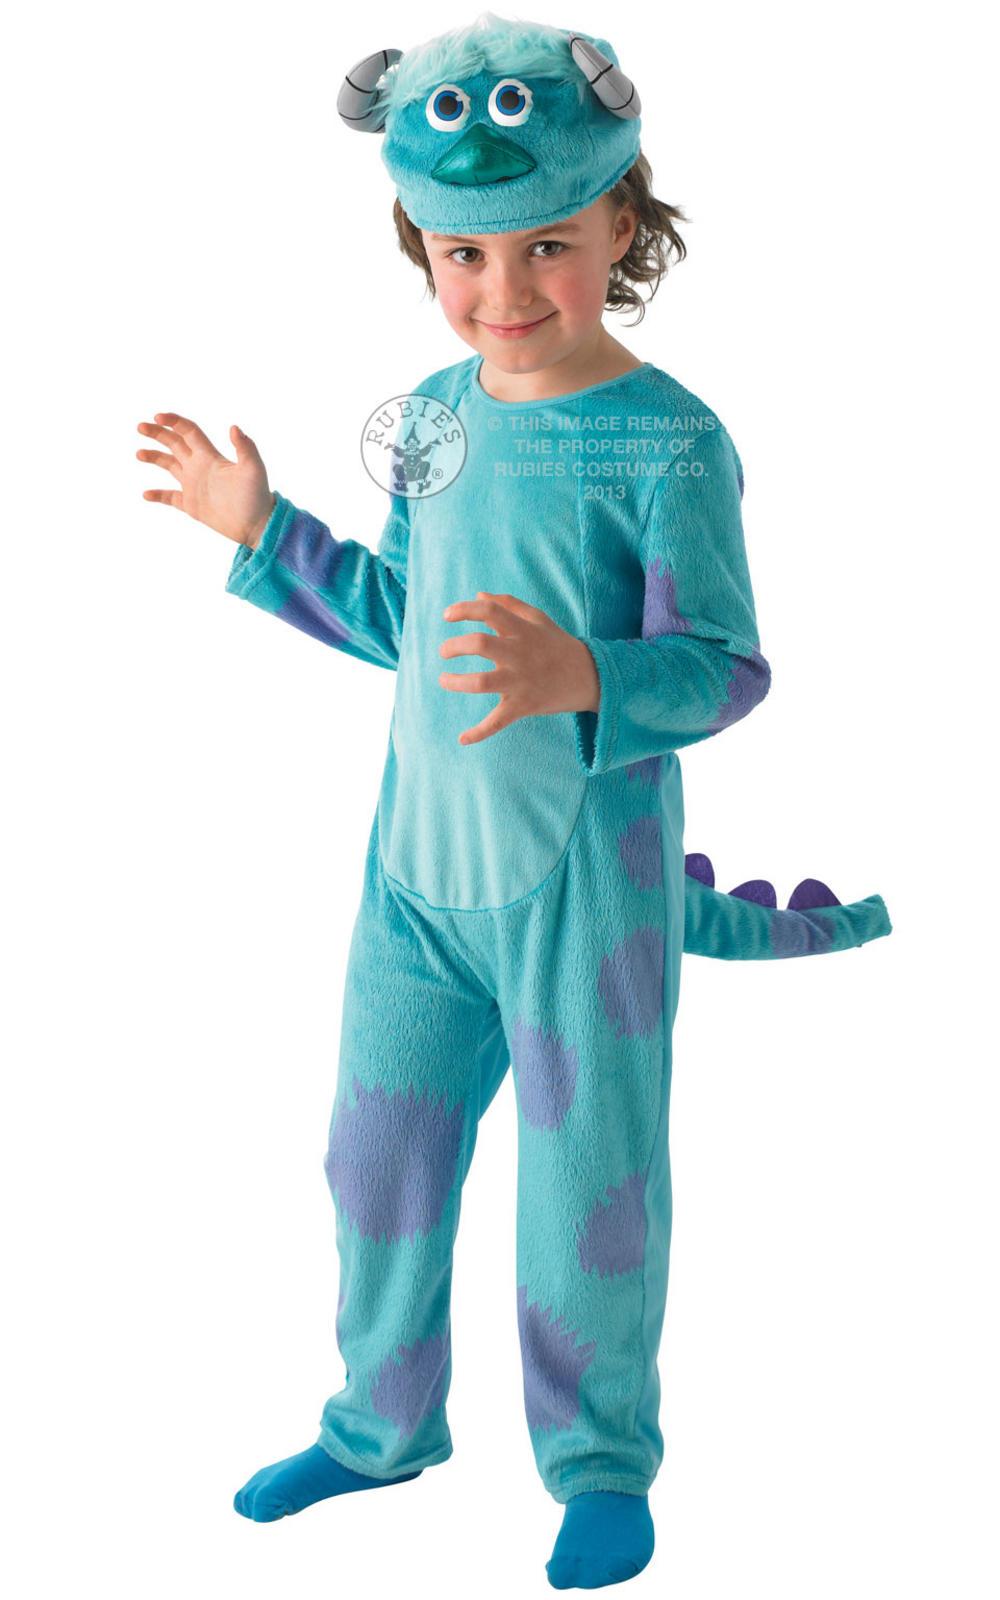 Child Monsters University Inc James P u0026#39;Sulleyu0026#39; Fancy Dress Costume Halloween Buy Online